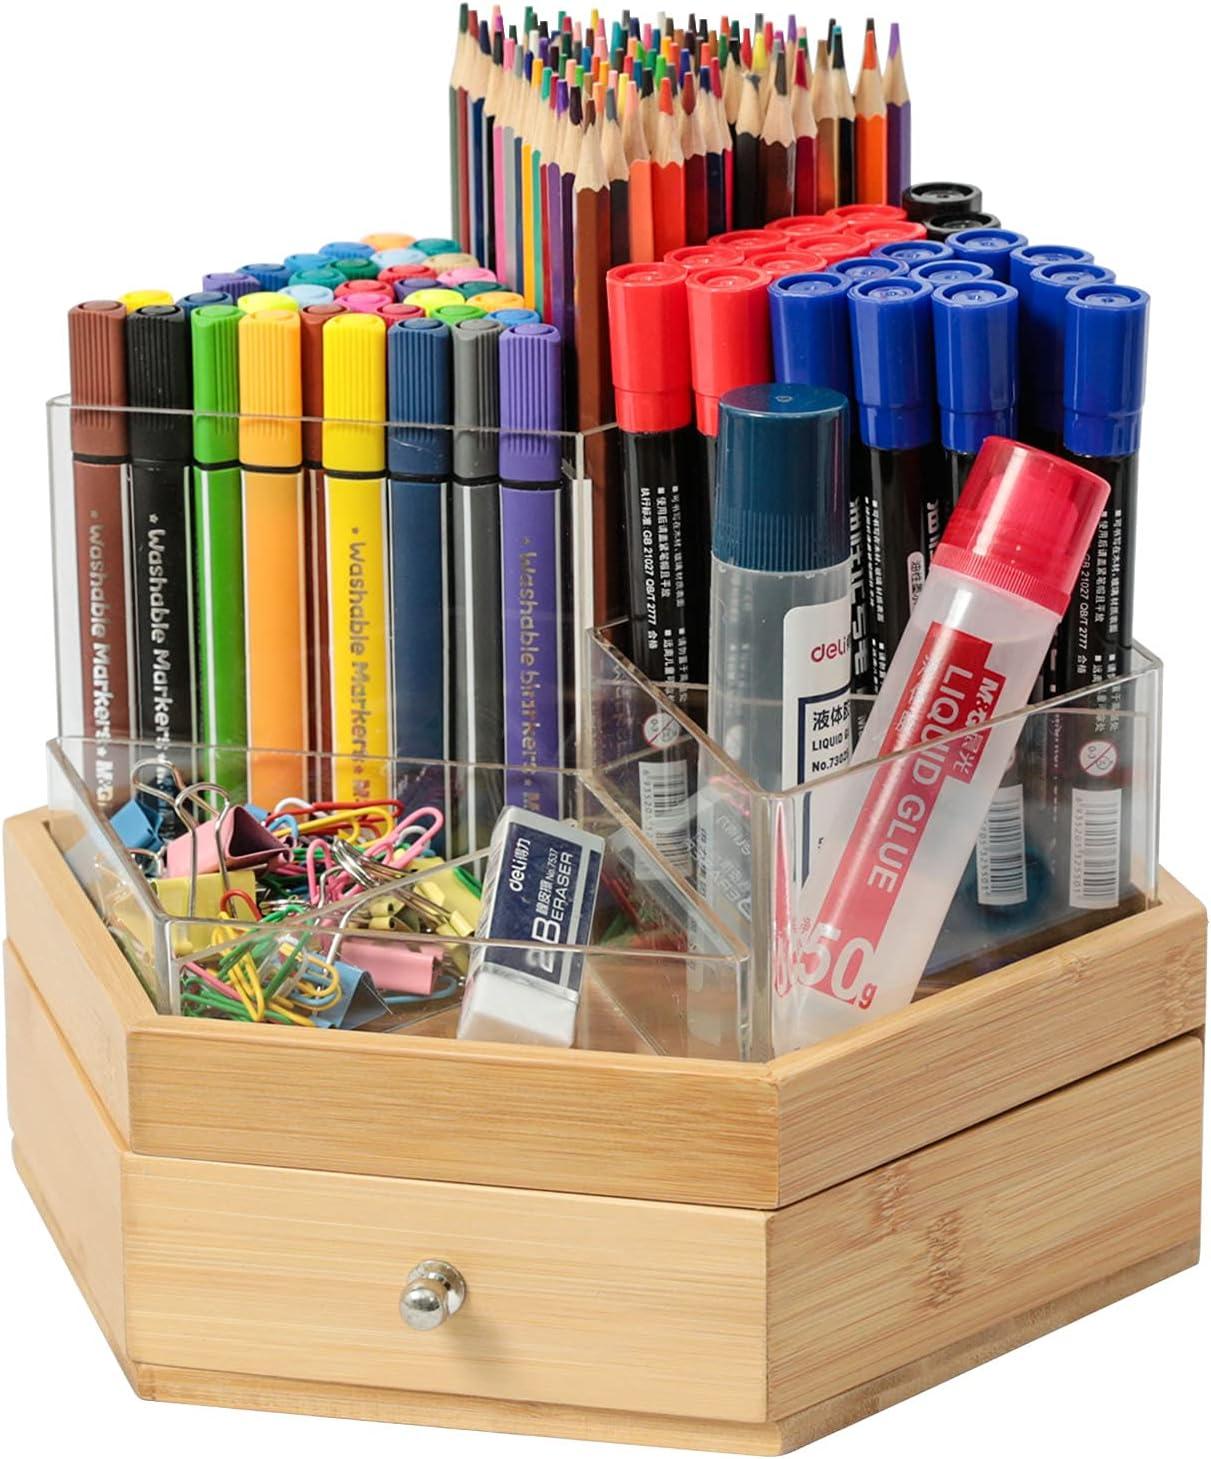 X-cosrack Acrylic Kansas City Mall Pen Holder Pencil Organi Detachable Clear New Shipping Free